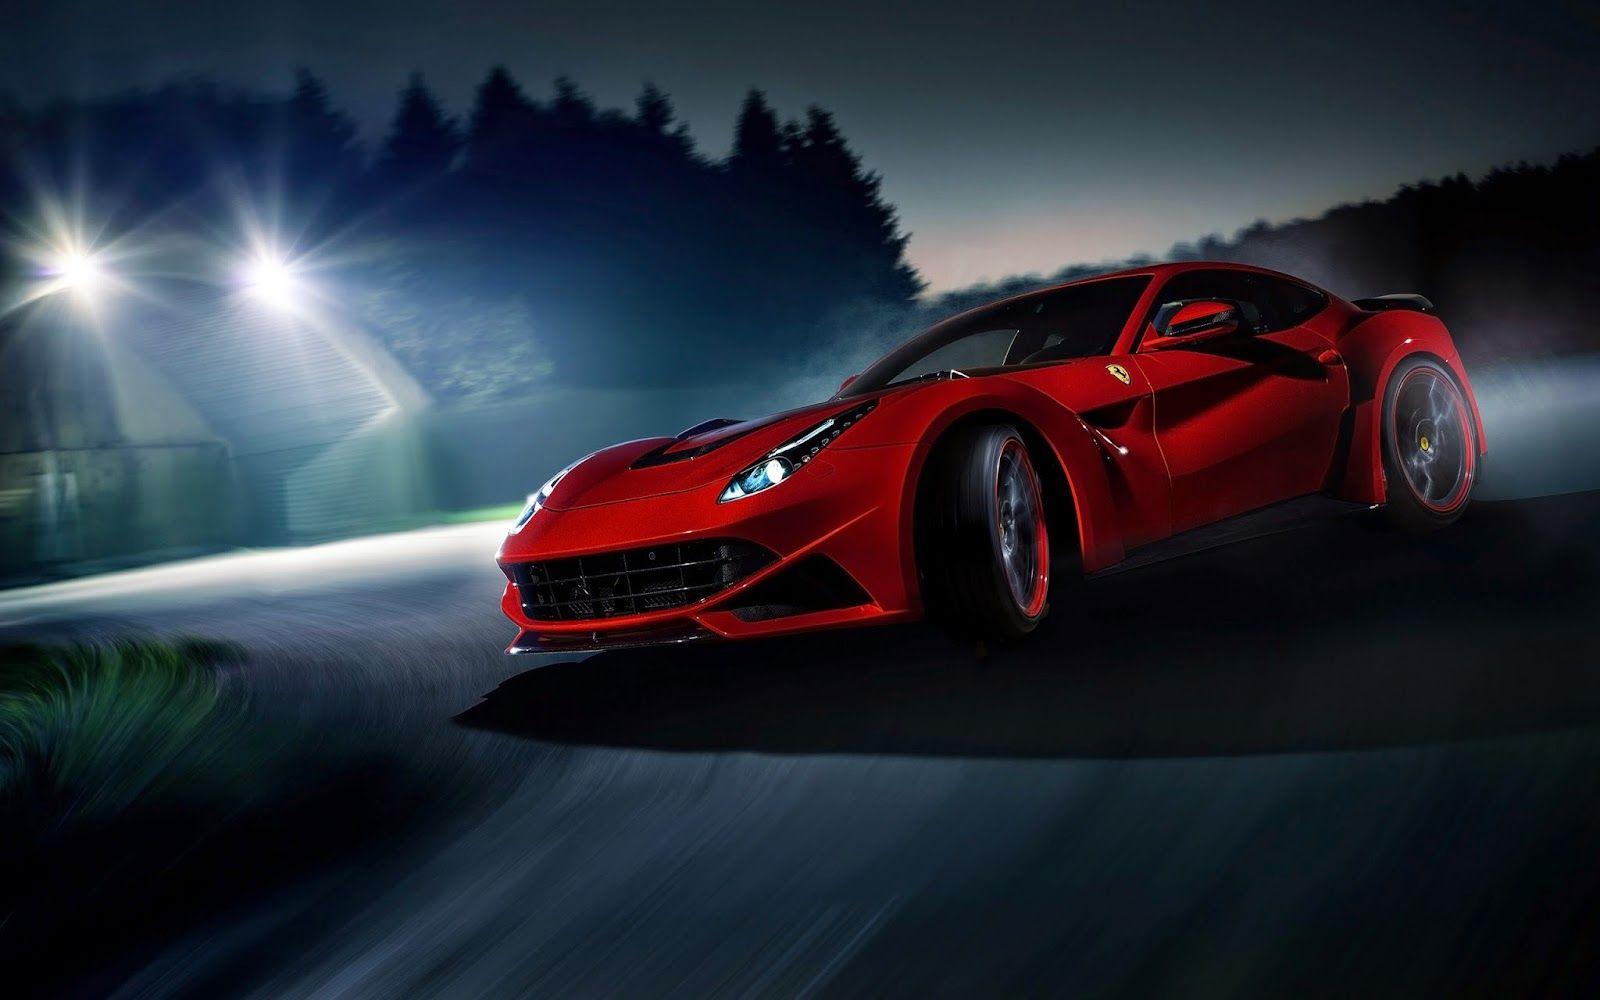 Wallpaper Mobil Sport Hd Mobil Sport Ferrari Mobil